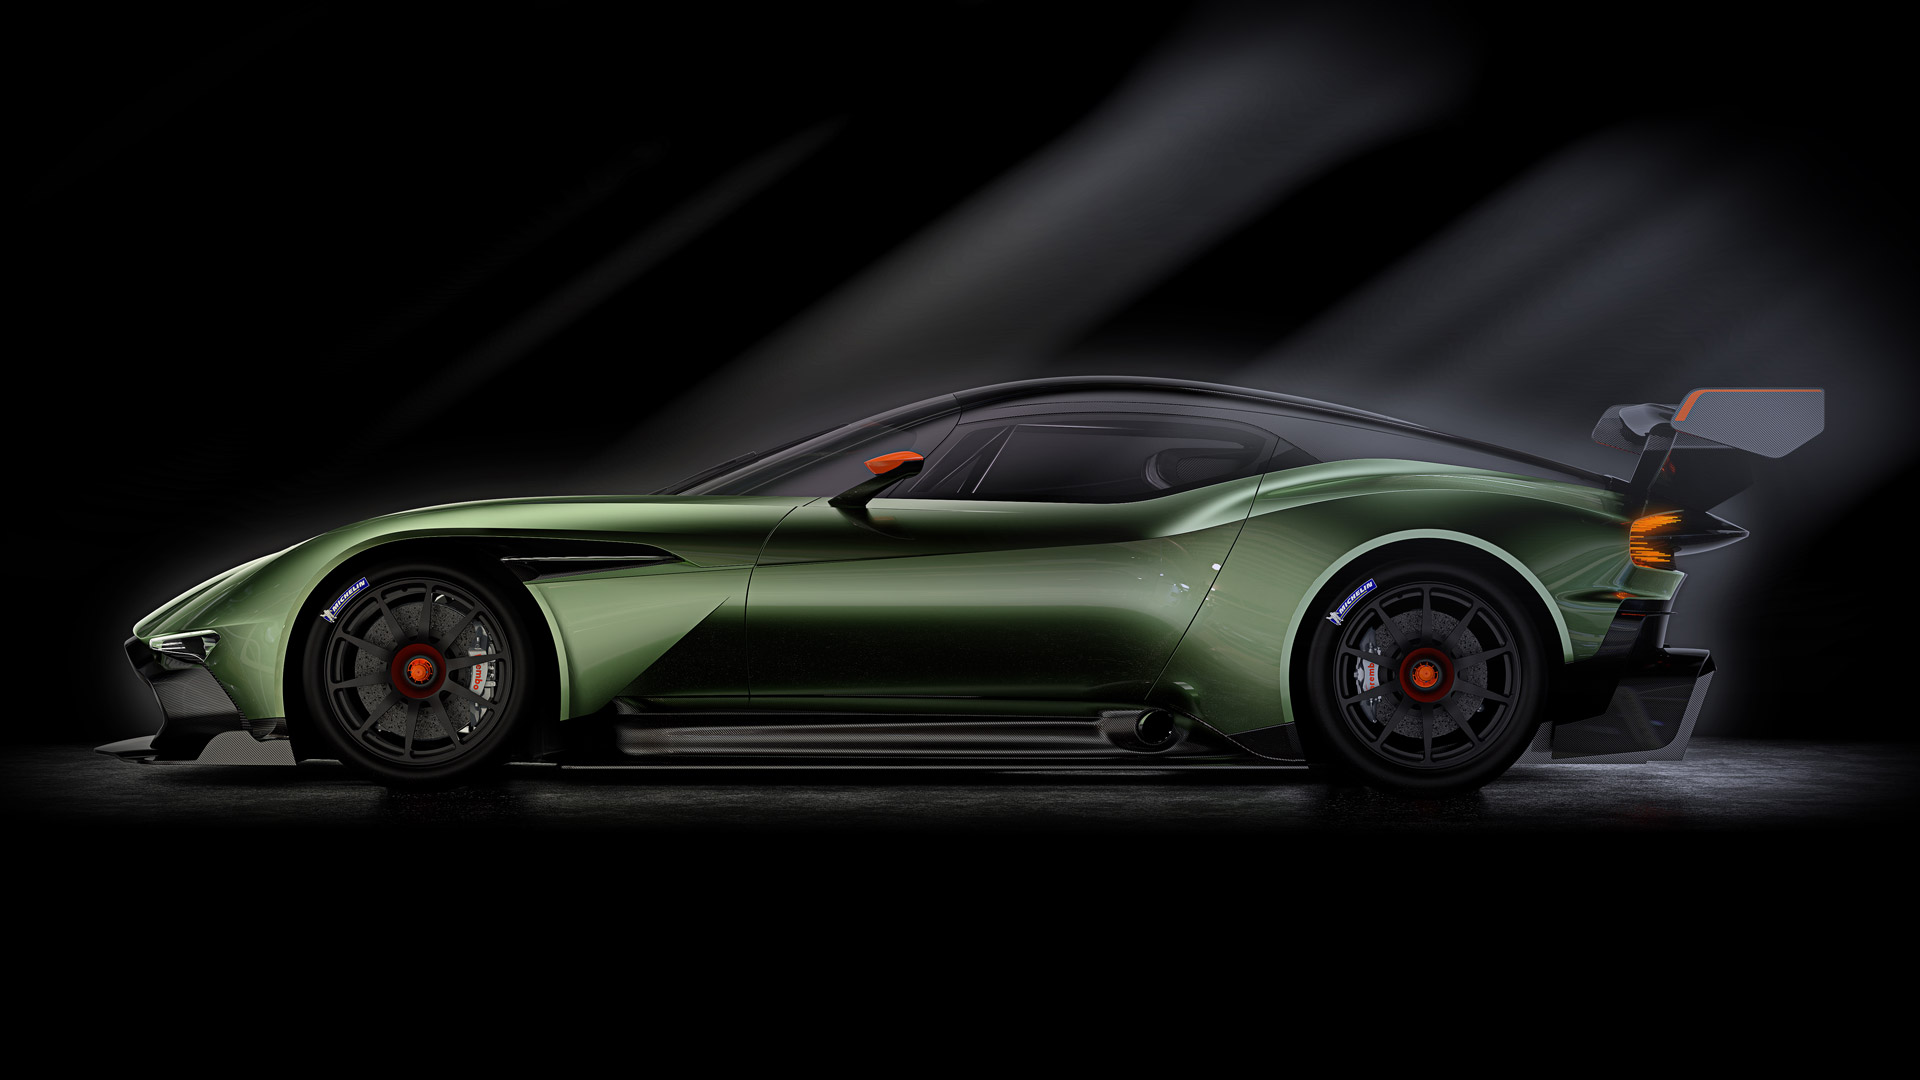 Aston Martin Vulcan, Mercedes-AMG GT3, Glickenhaus SCG003S: This Week's Top Photos